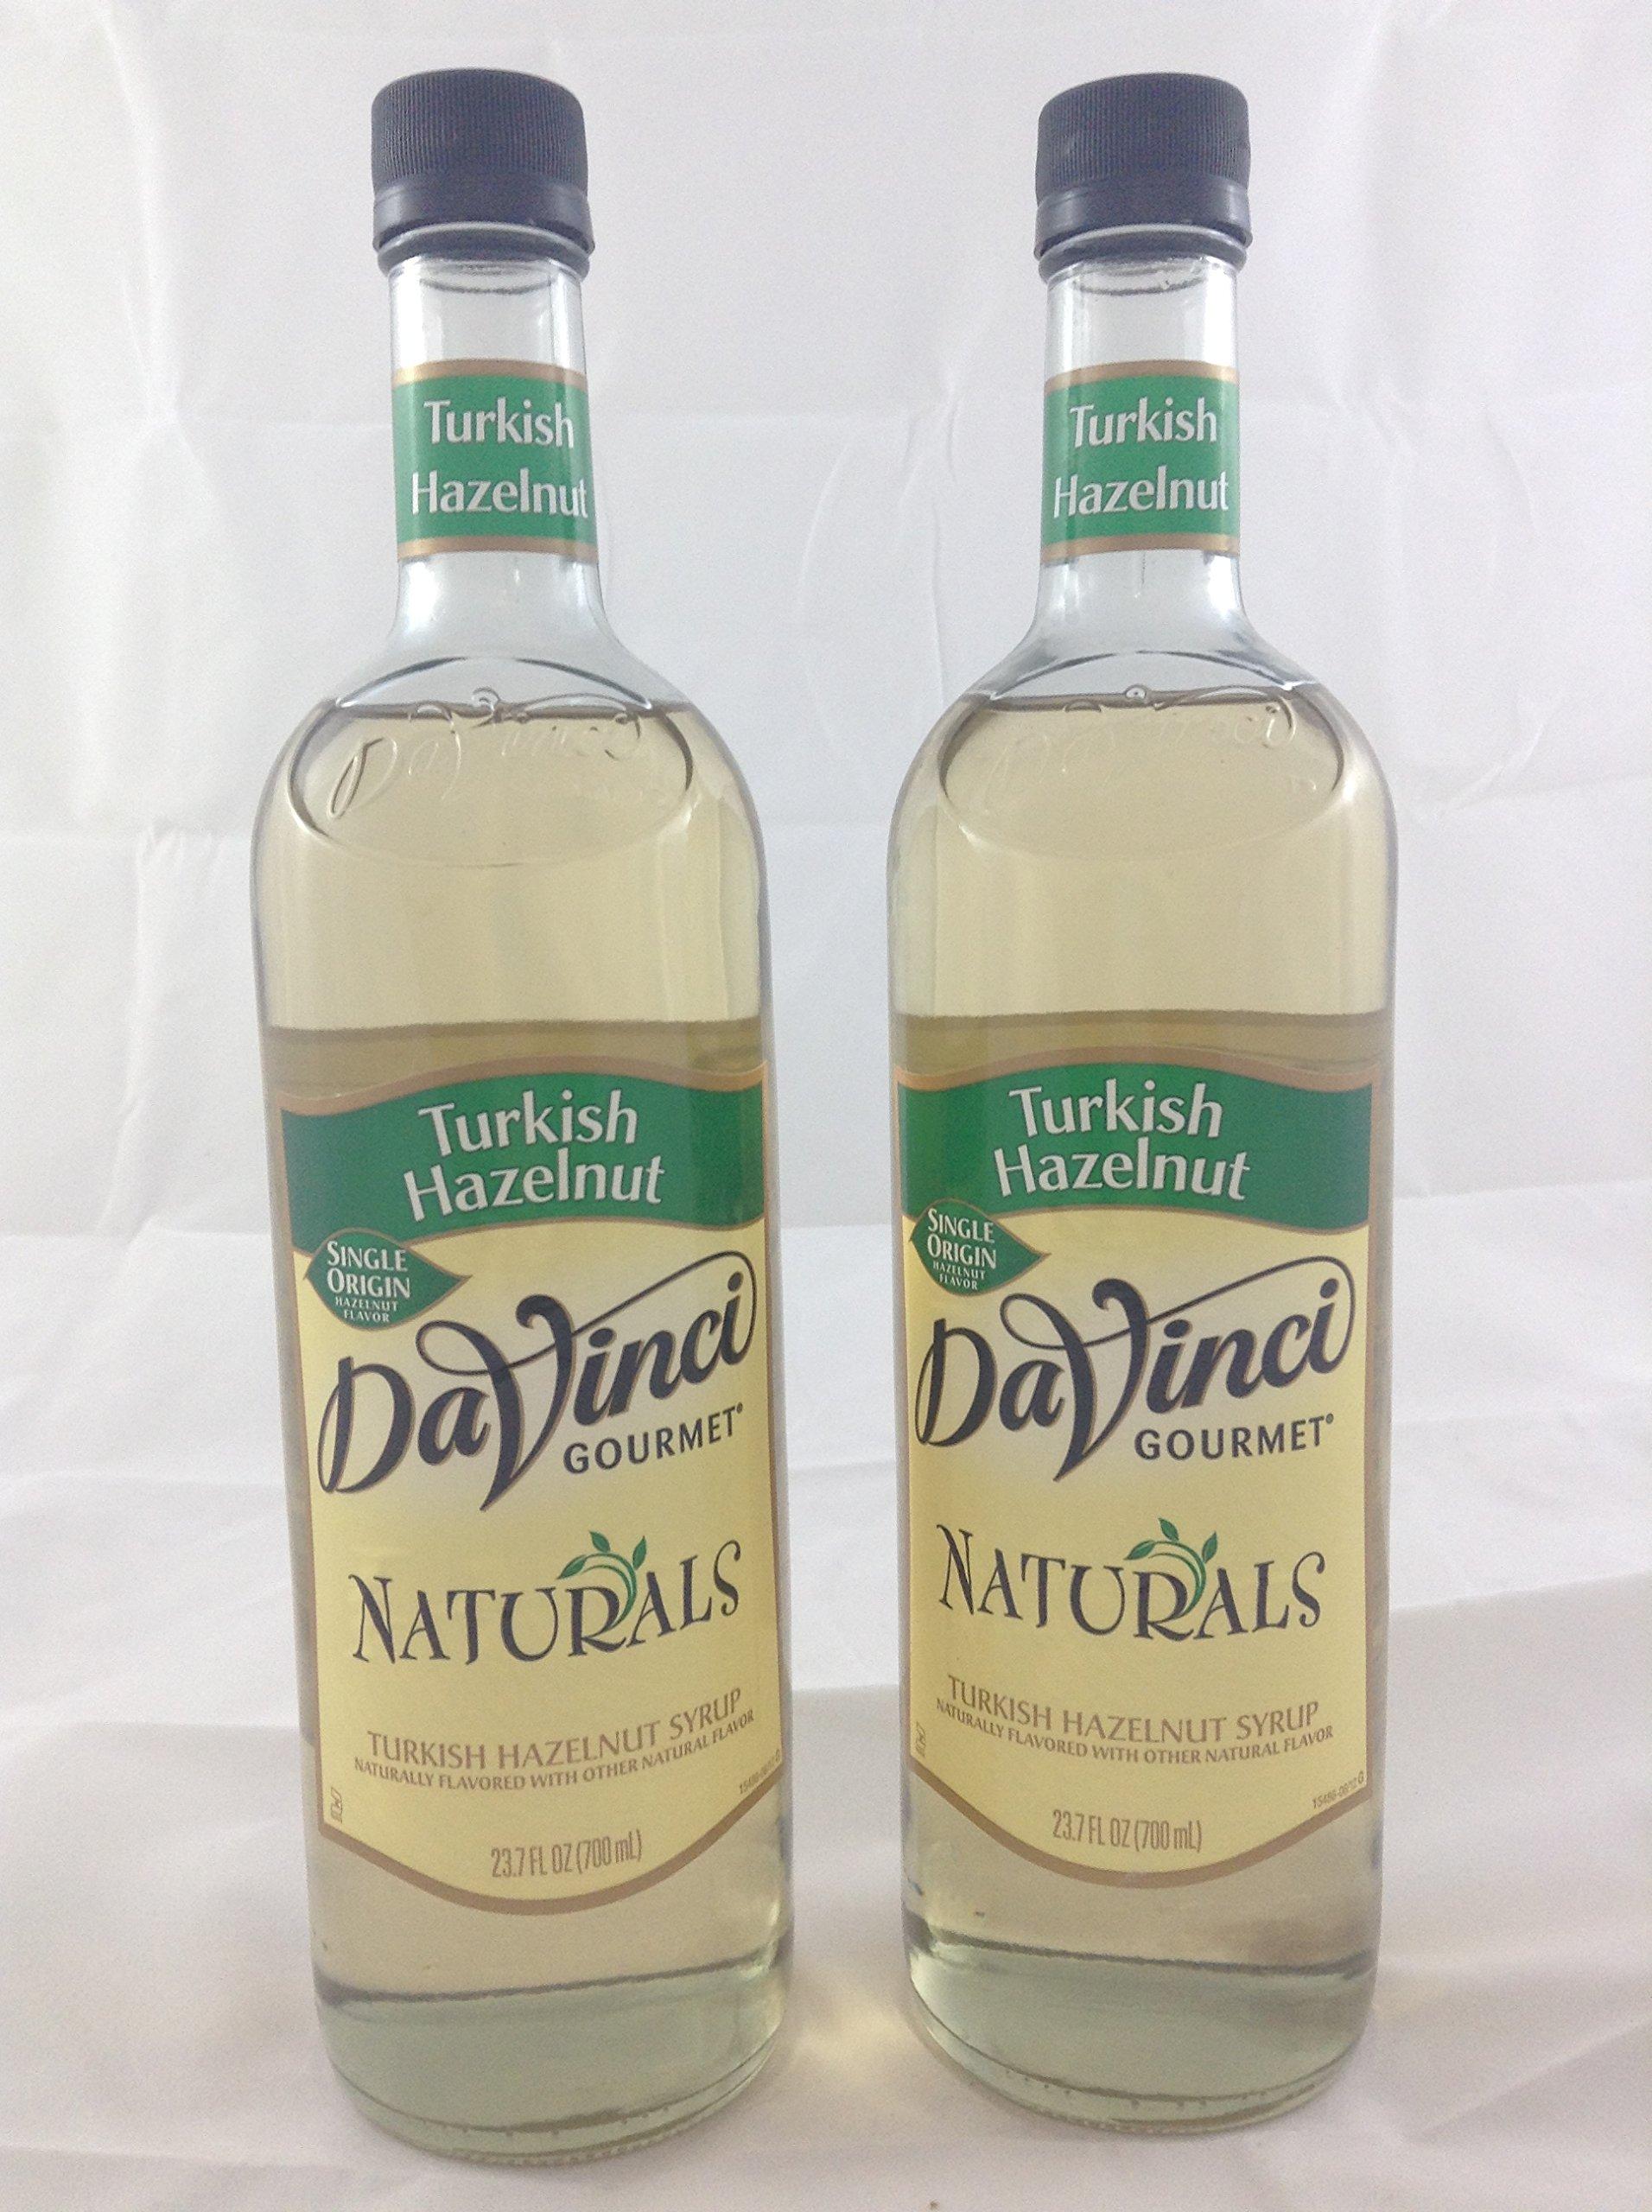 DaVinci Gourmet Natural Instincts Turkish Hazelnut Flavored Syrup 2 Bottles